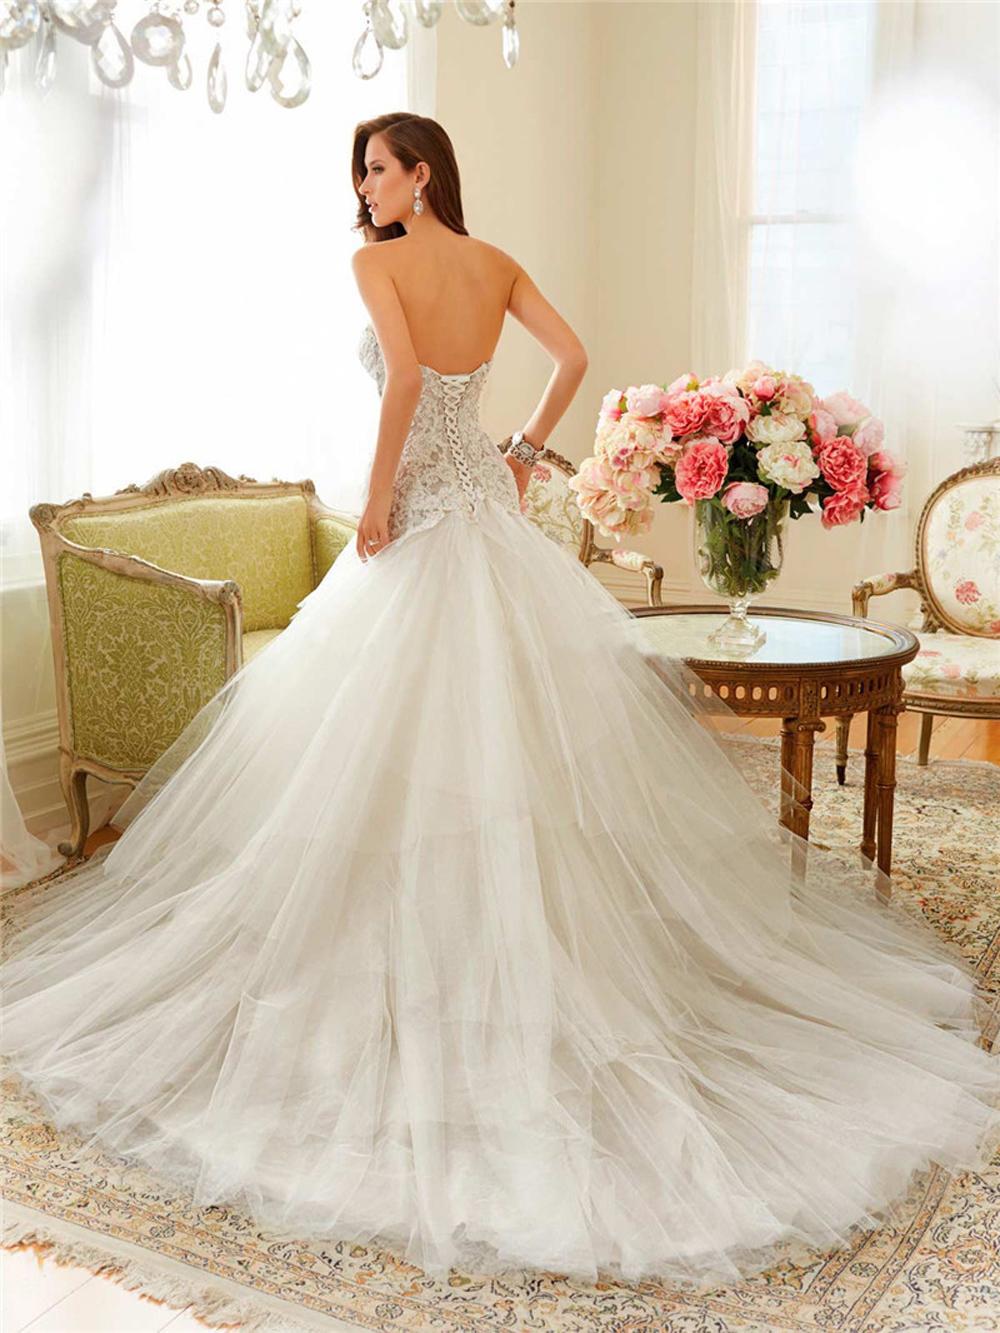 Romântico sexy lace querida sereia vestido de casamento Backless 2016 nova chegada mangas apliques vestido de noiva